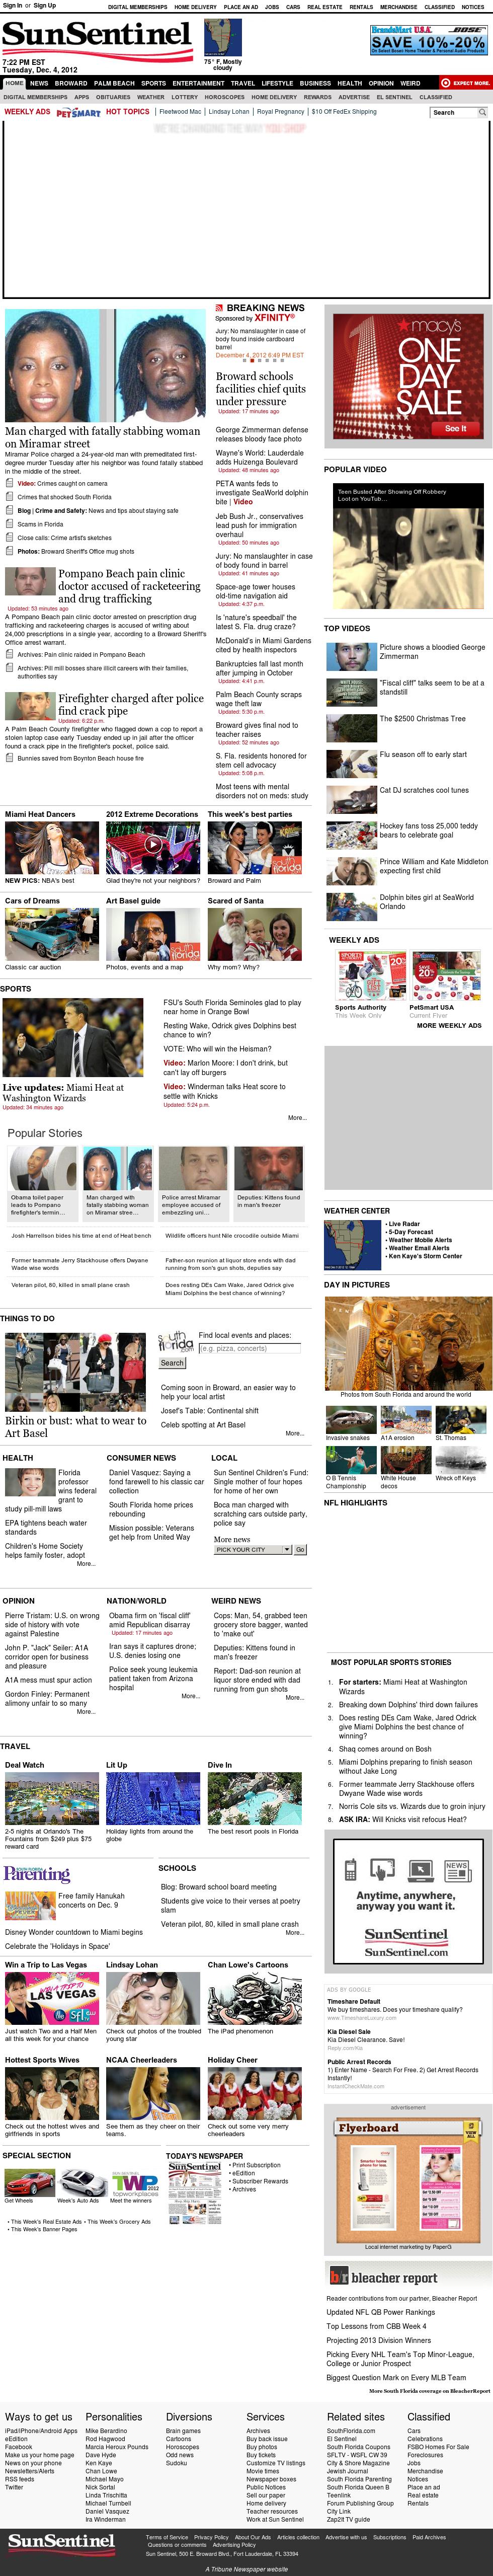 (Florida) Sun Sentinel at Wednesday Dec. 5, 2012, 12:30 a.m. UTC